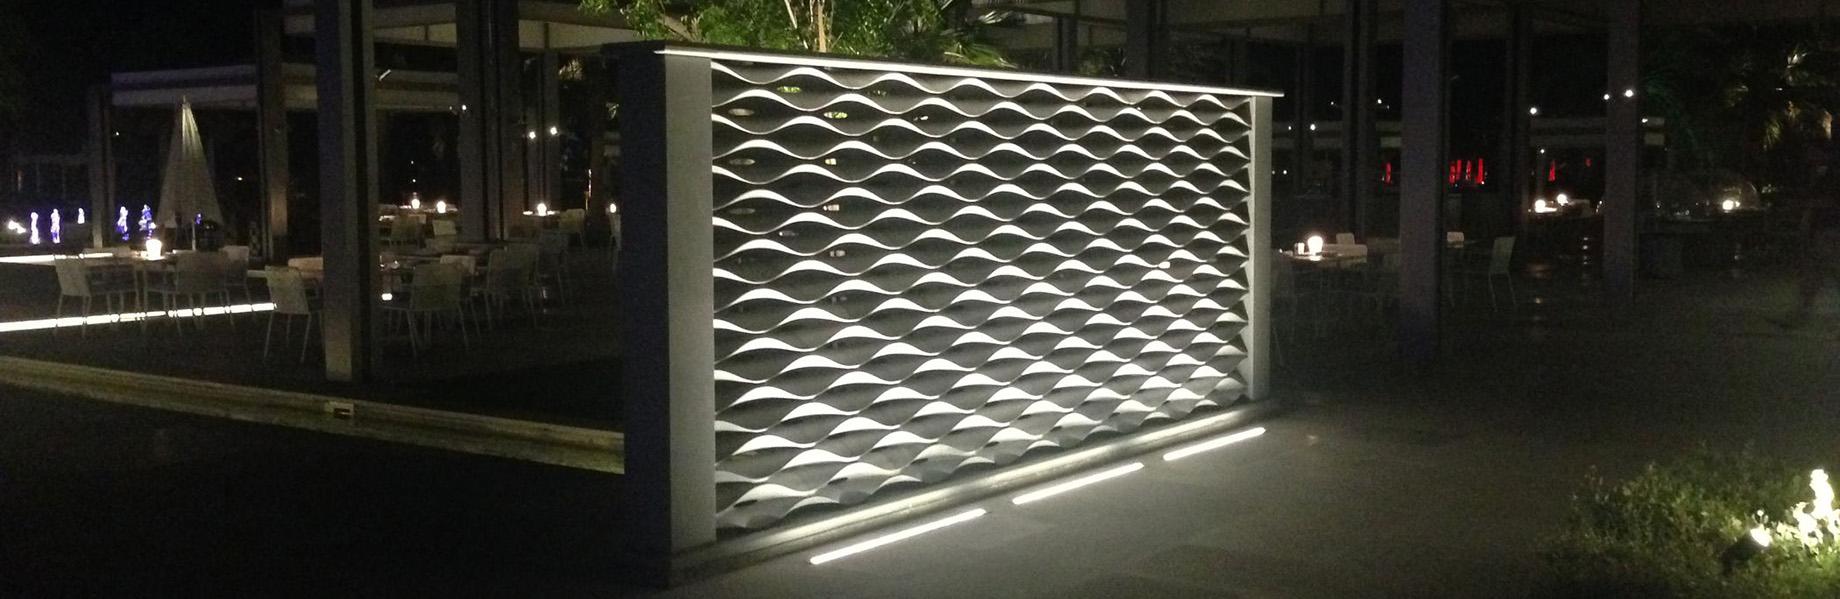 onda design stone divider